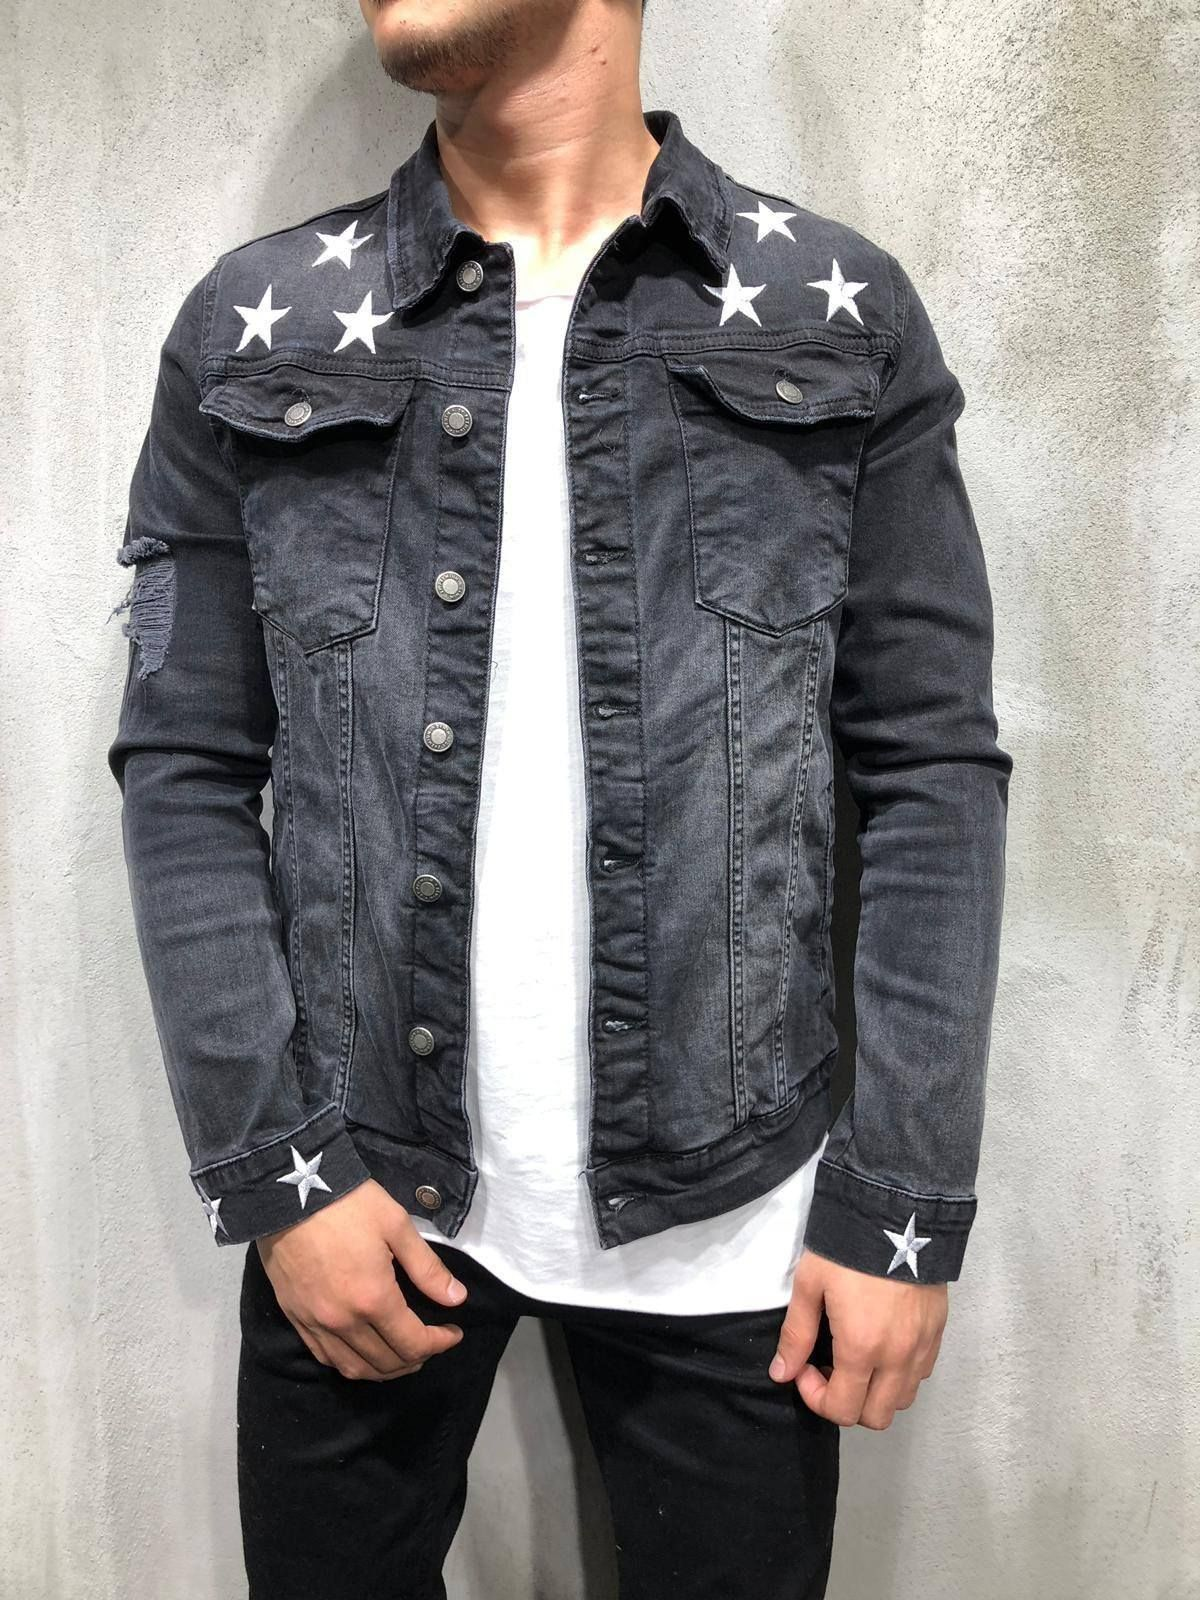 Trucker Denim Jacket Ripped Star Embroidery Black In 2019 Jacket